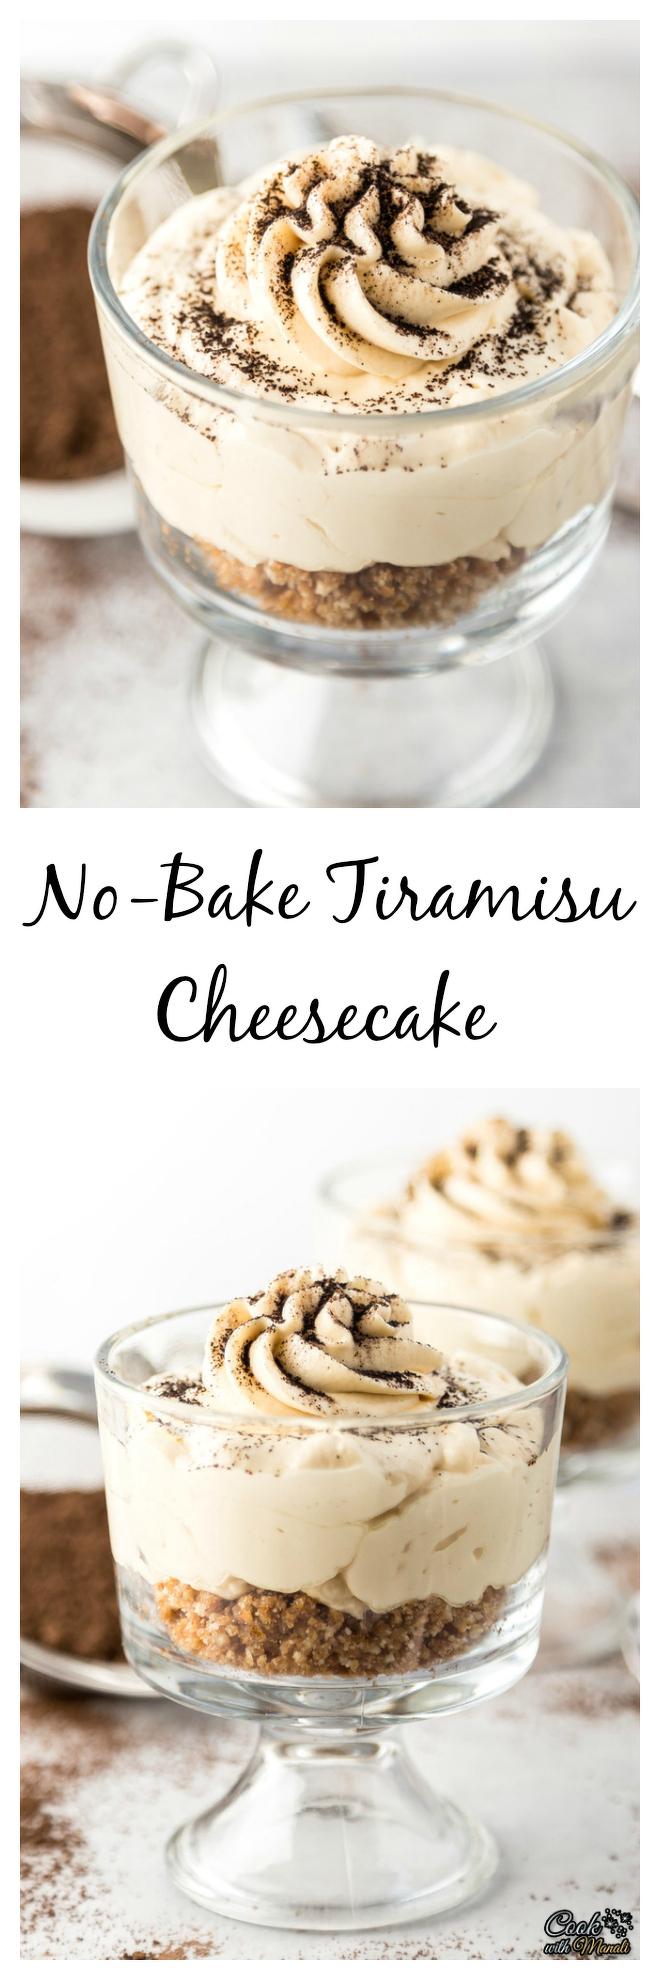 Individual No Bake Tiramisu Cheesecake-Collage-nocwm